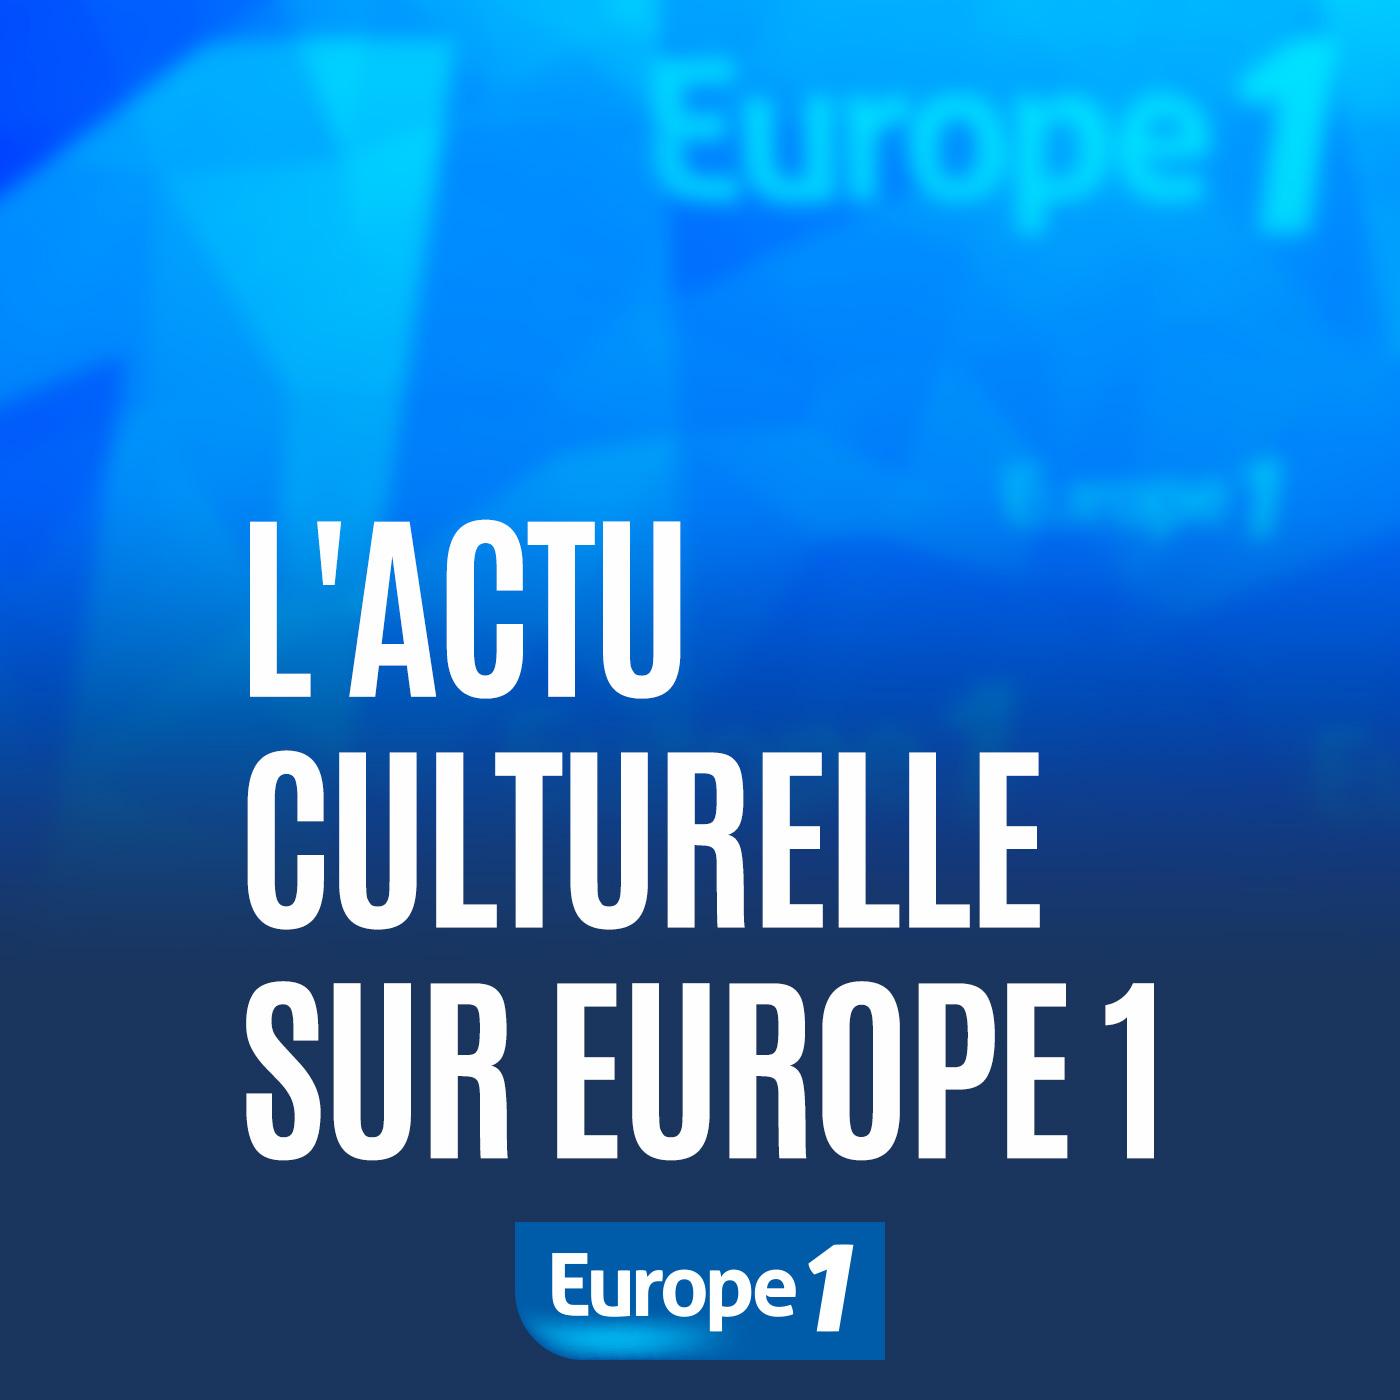 Image 1: L actu culturelle sur Europe 1